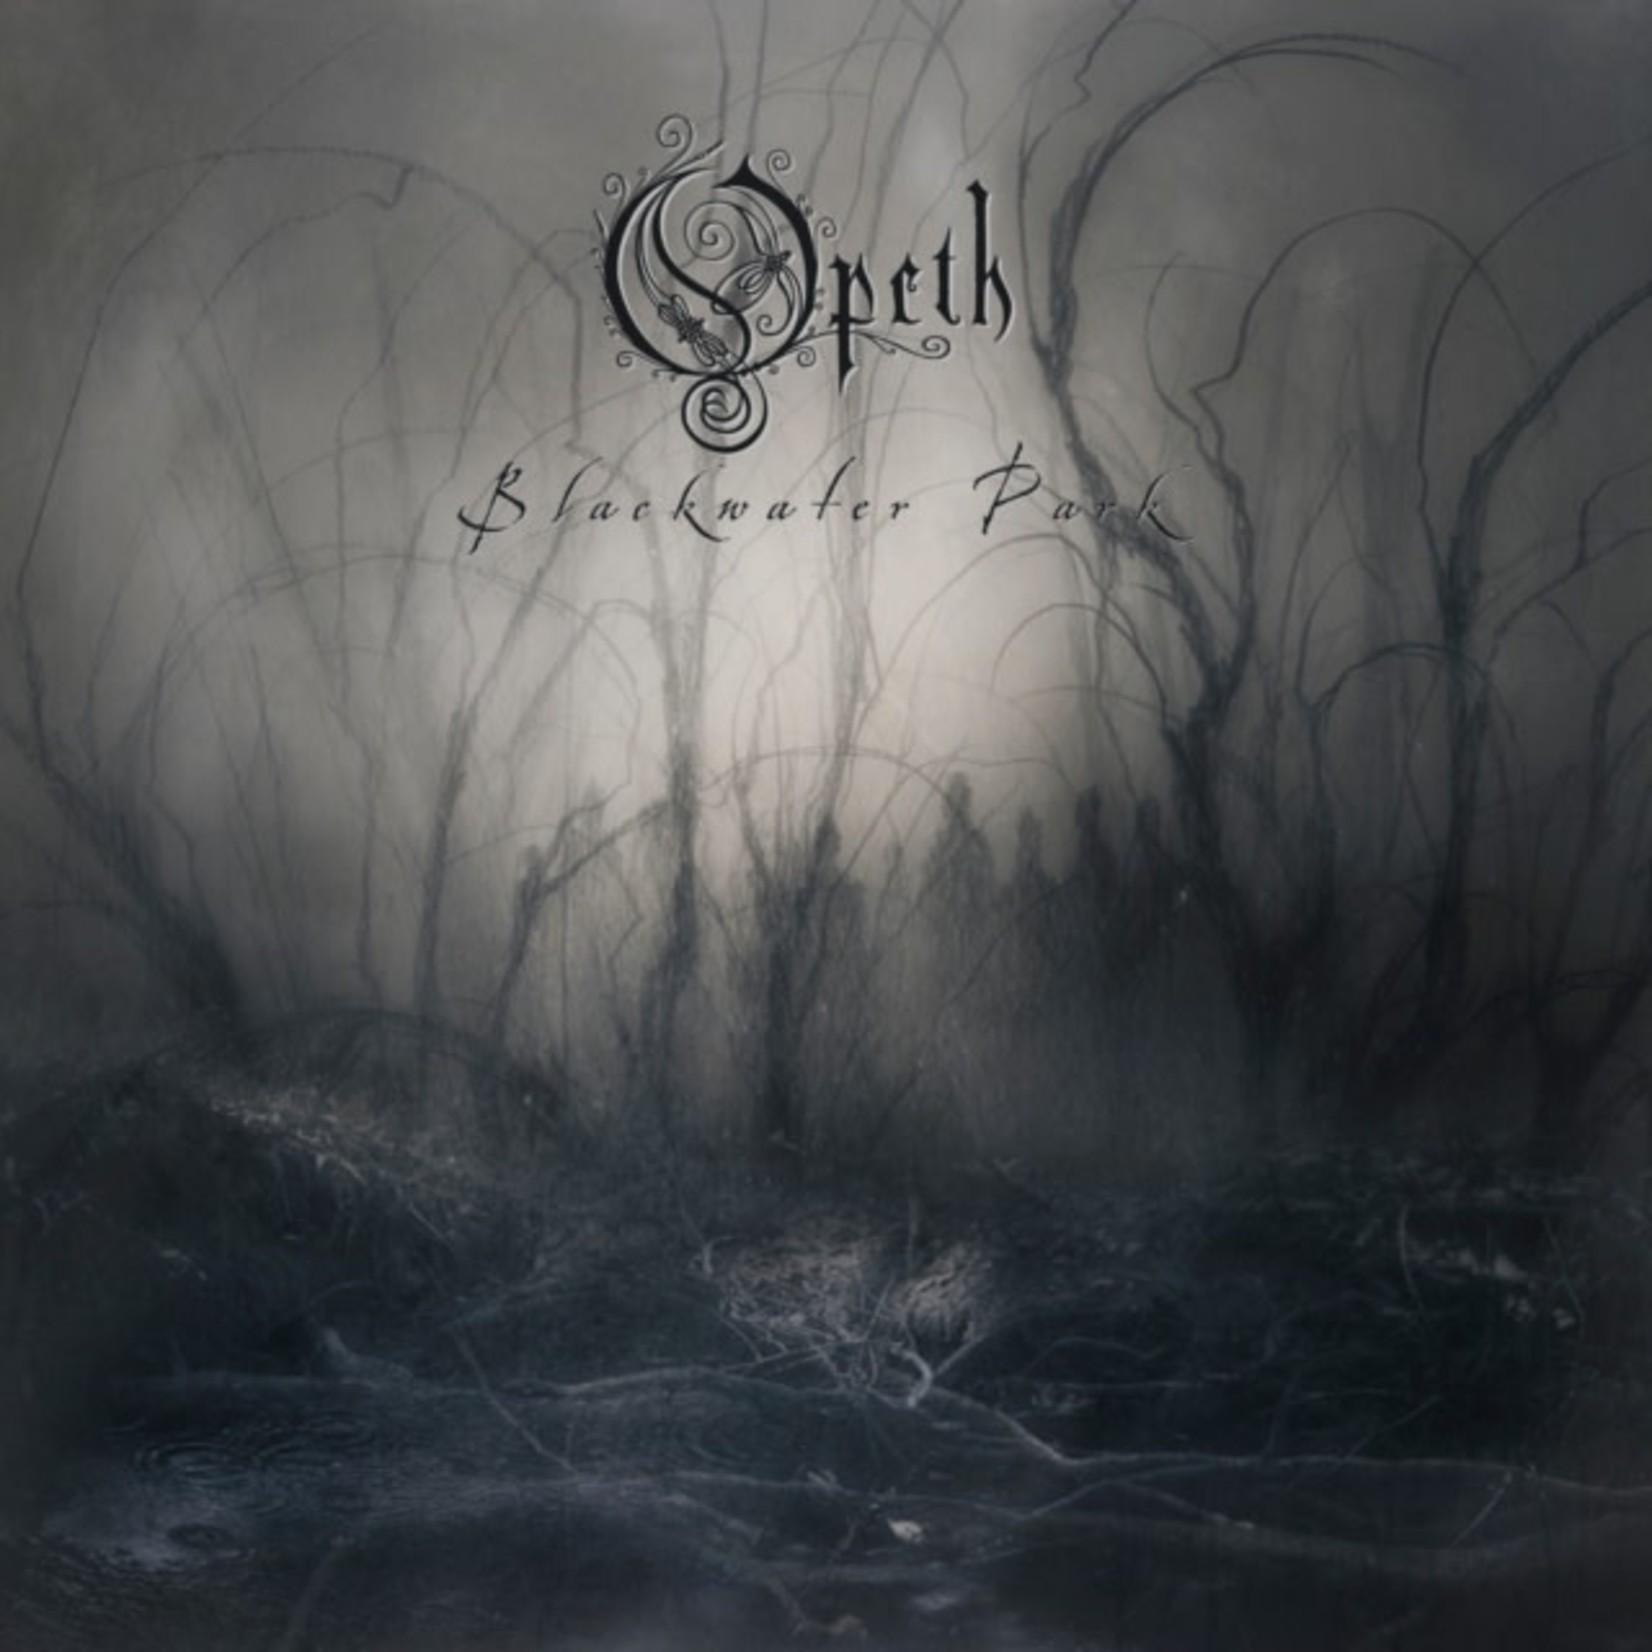 Vinyl Opeth - Blackwater Park (20th Anniversary - Black Smokey Viny)